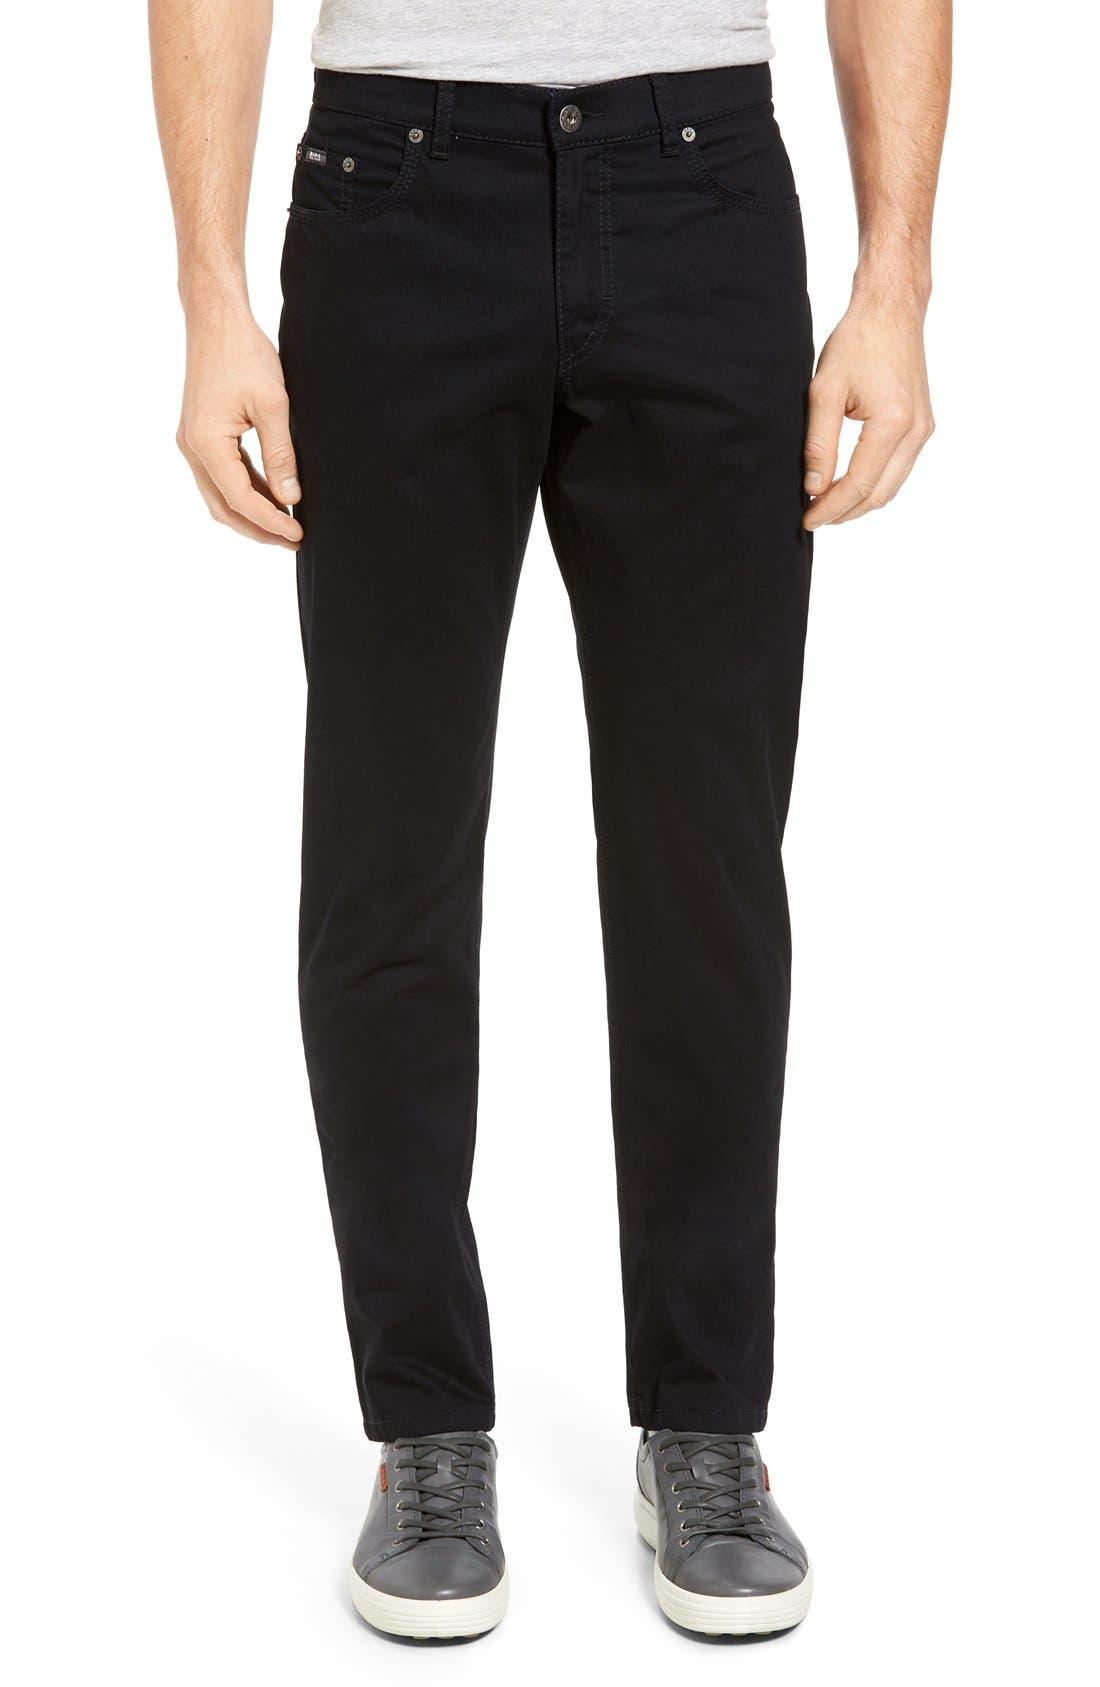 Brax Cooper Prestige Stretch Cotton Pants